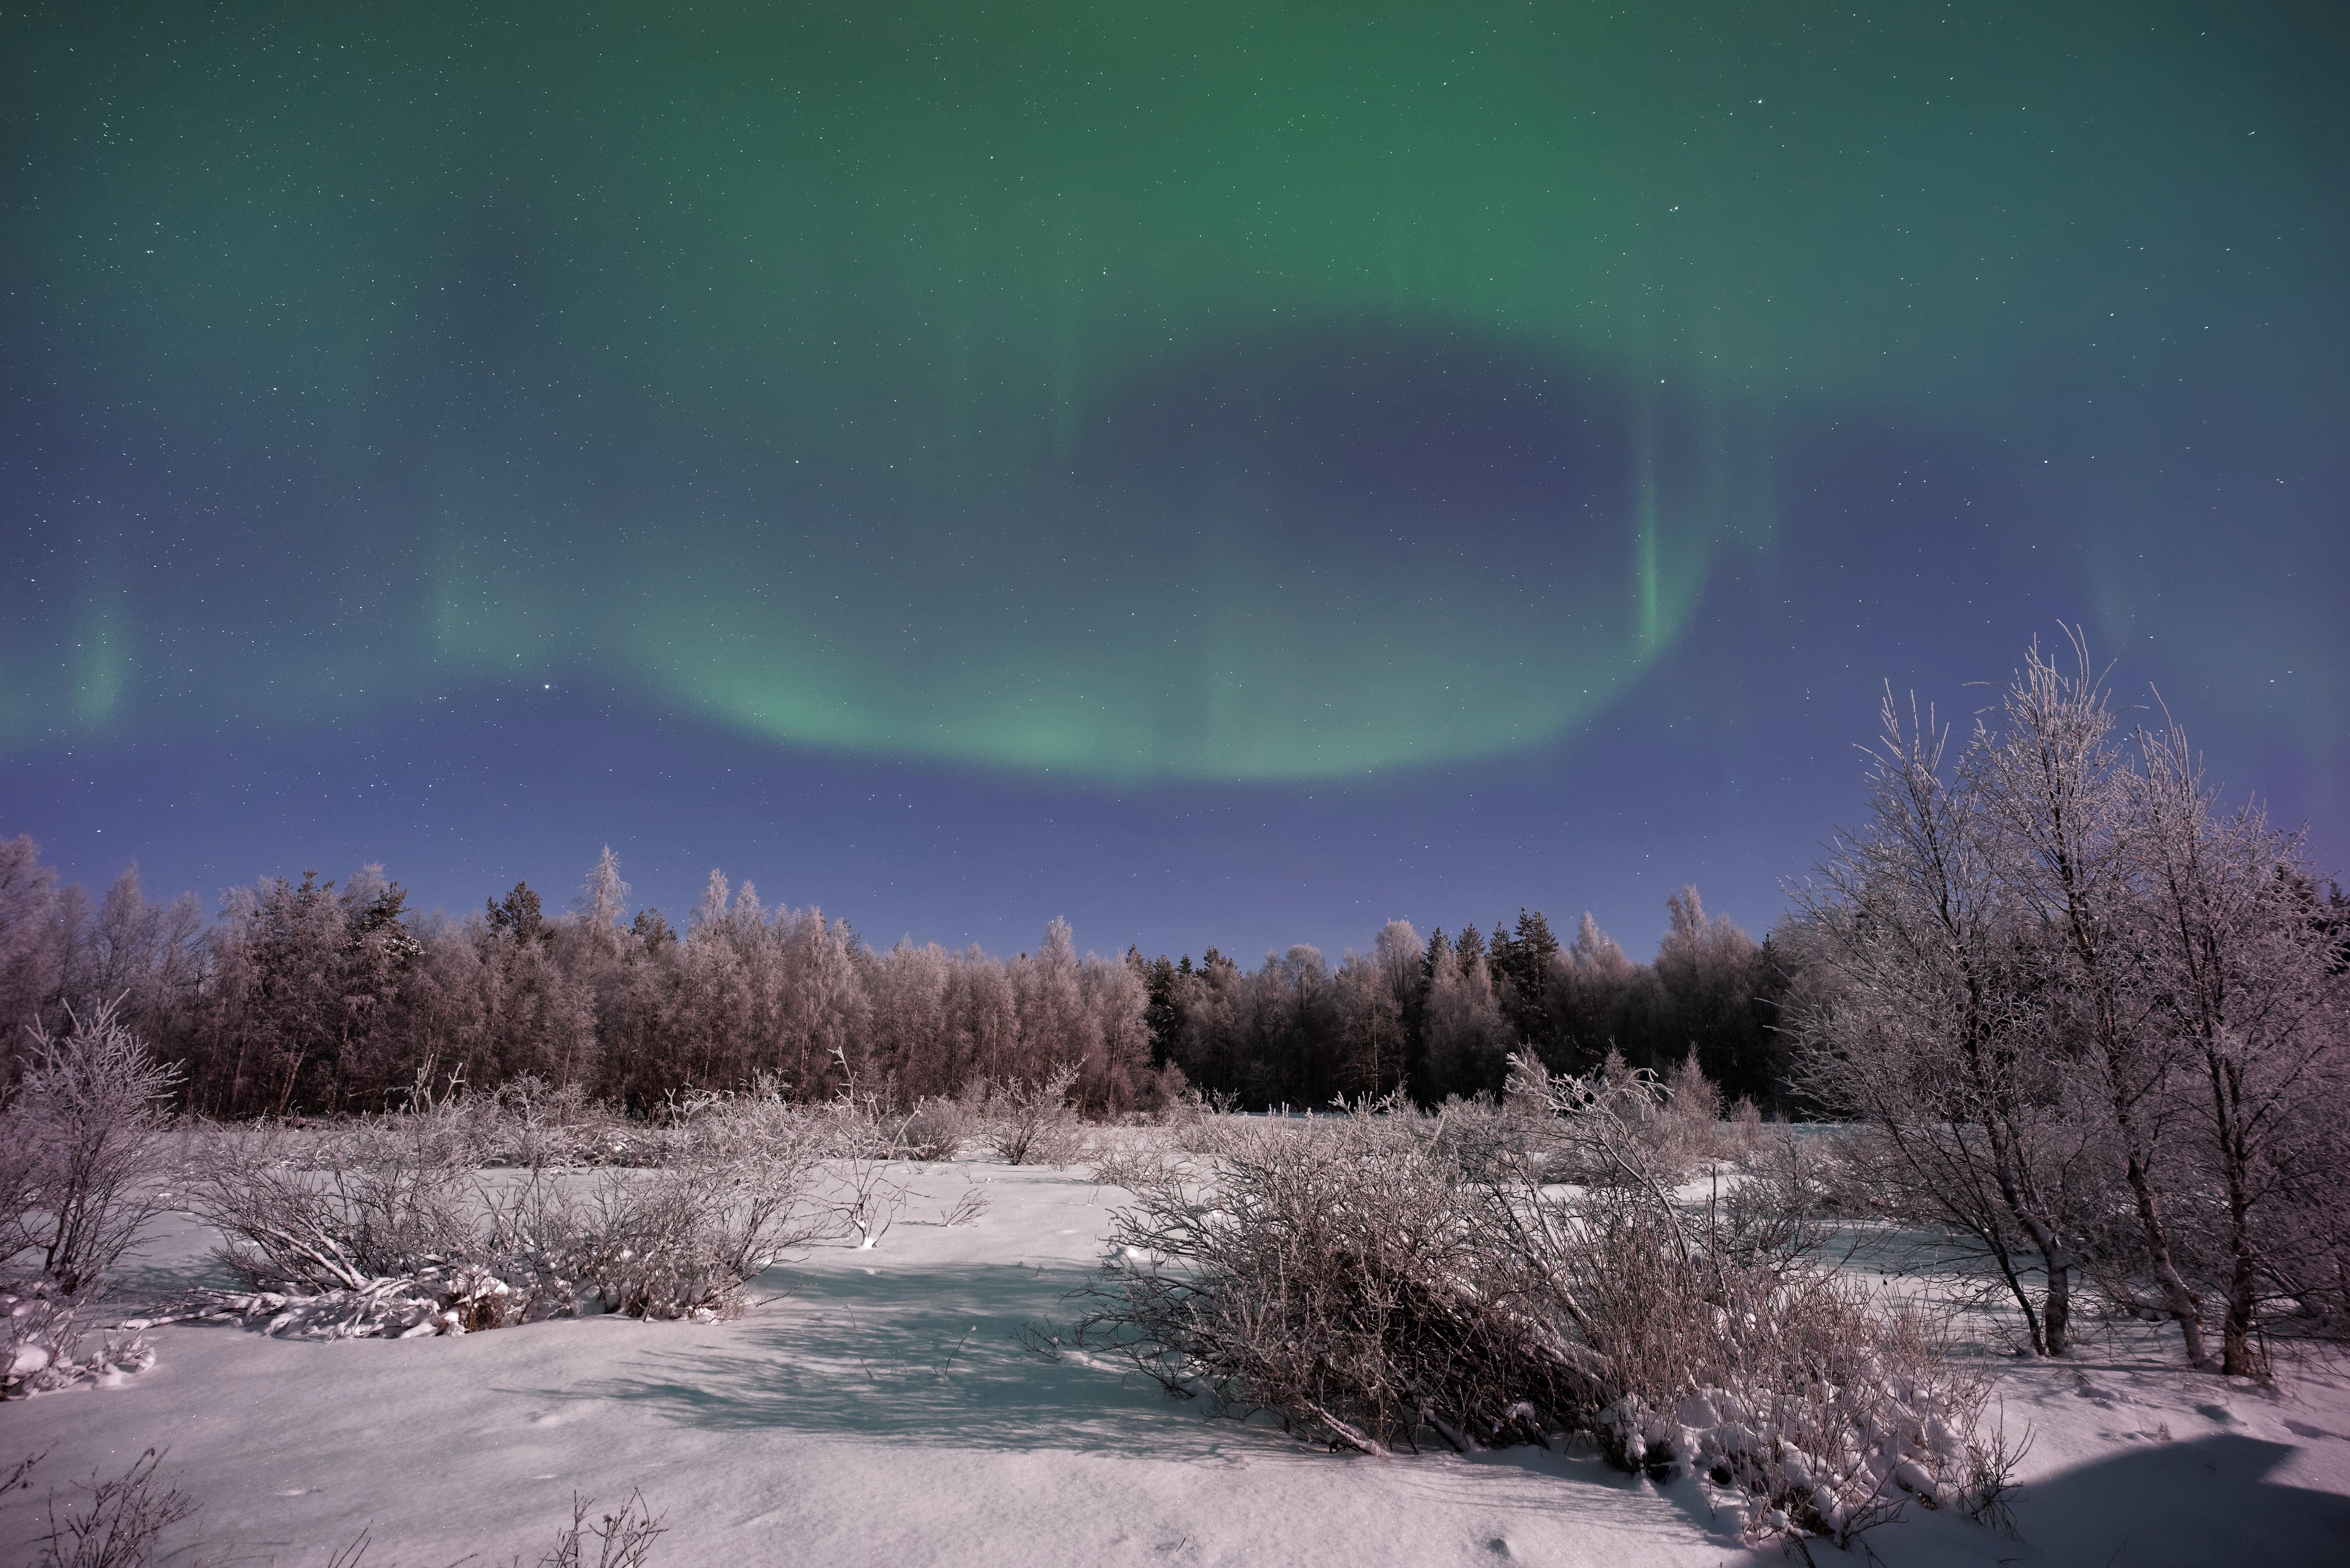 tree covered field under Aurora Borealis